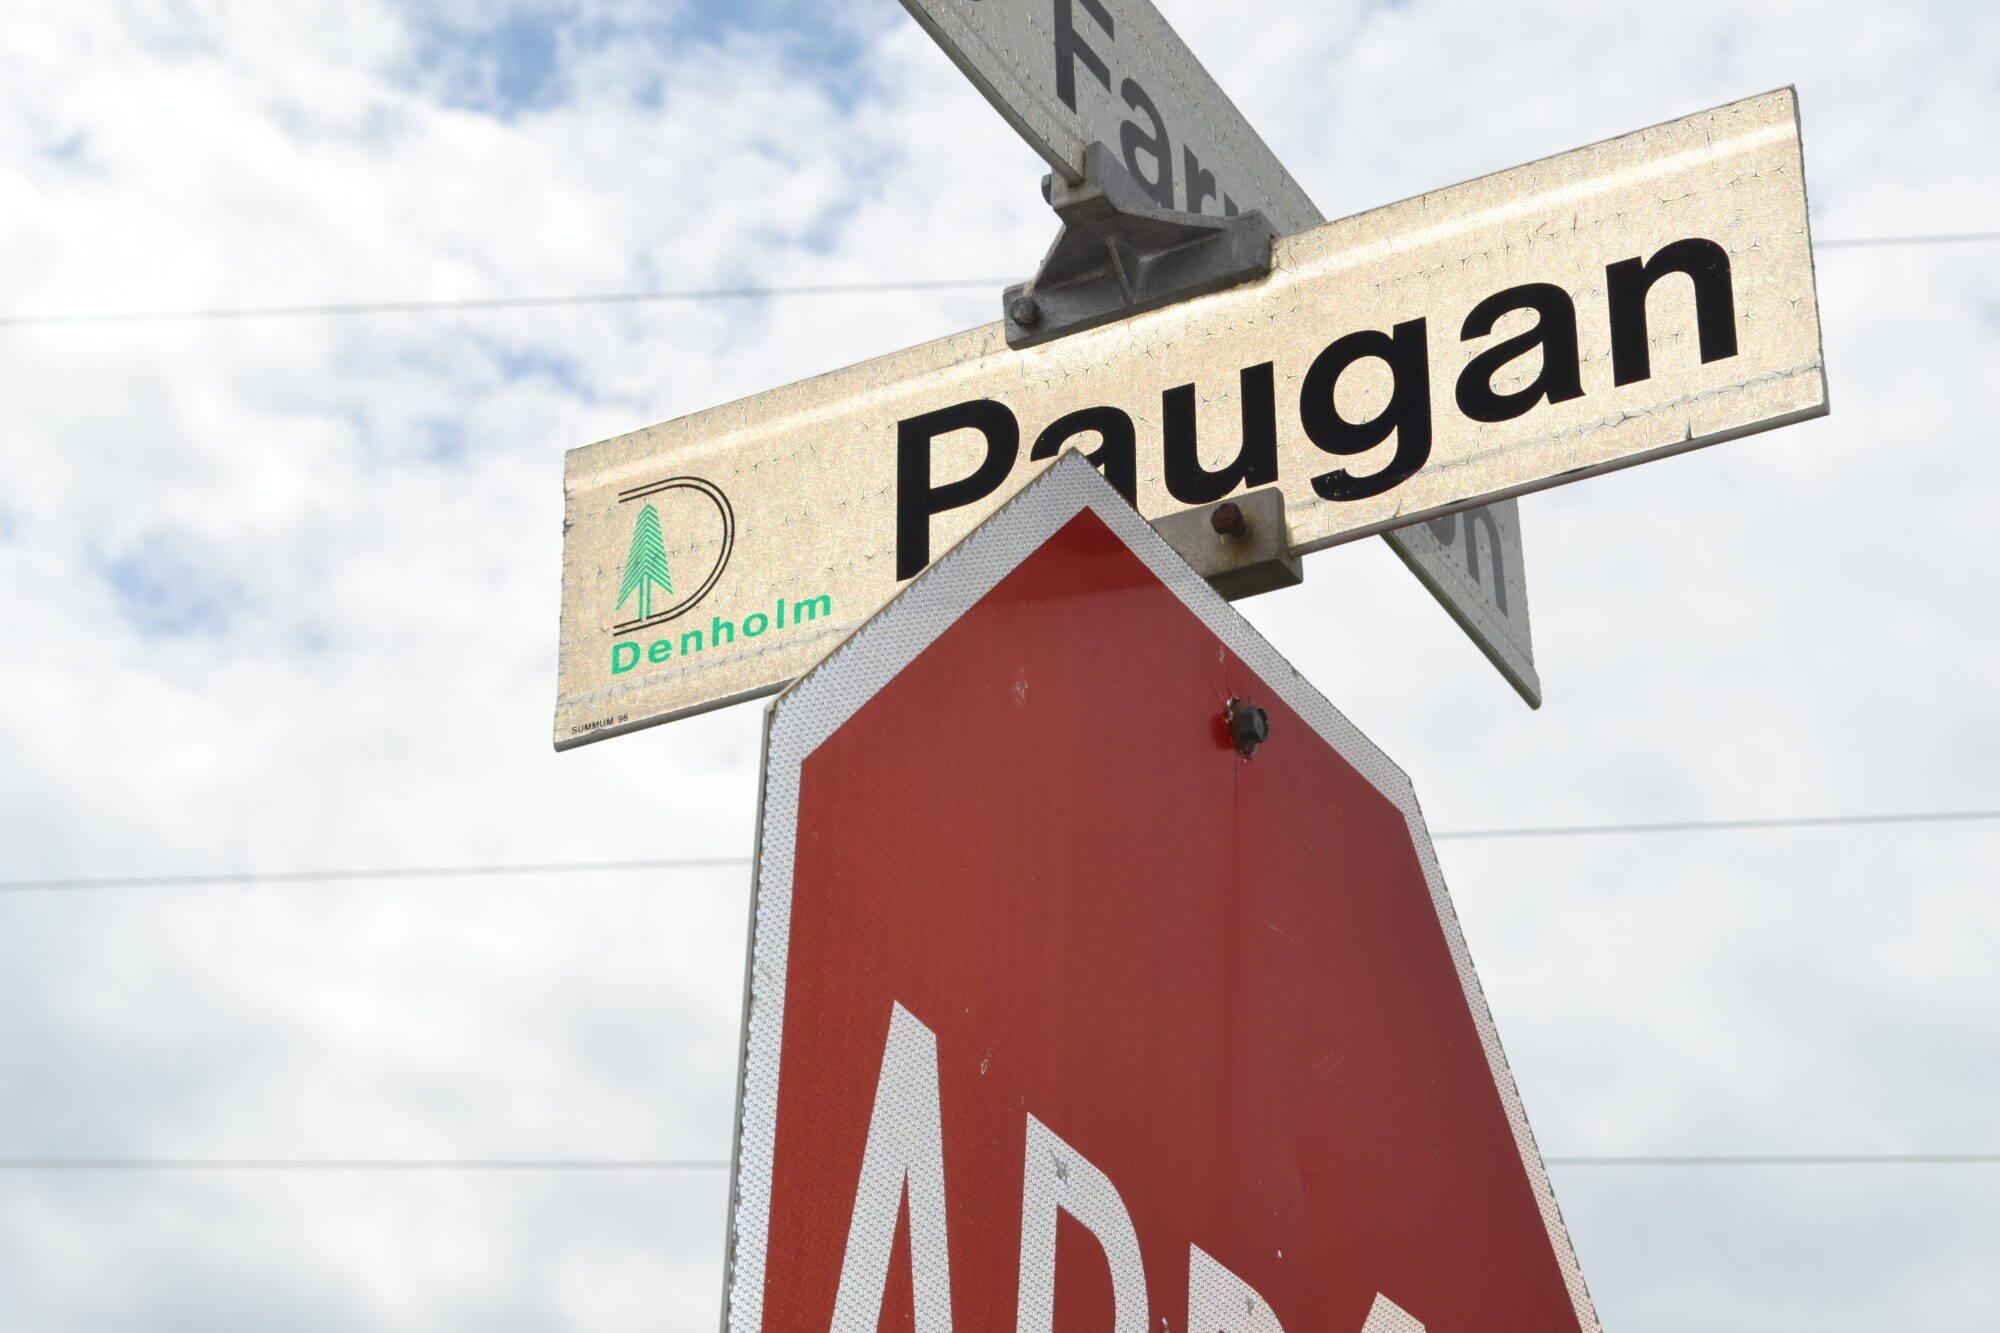 Denholm Paugan